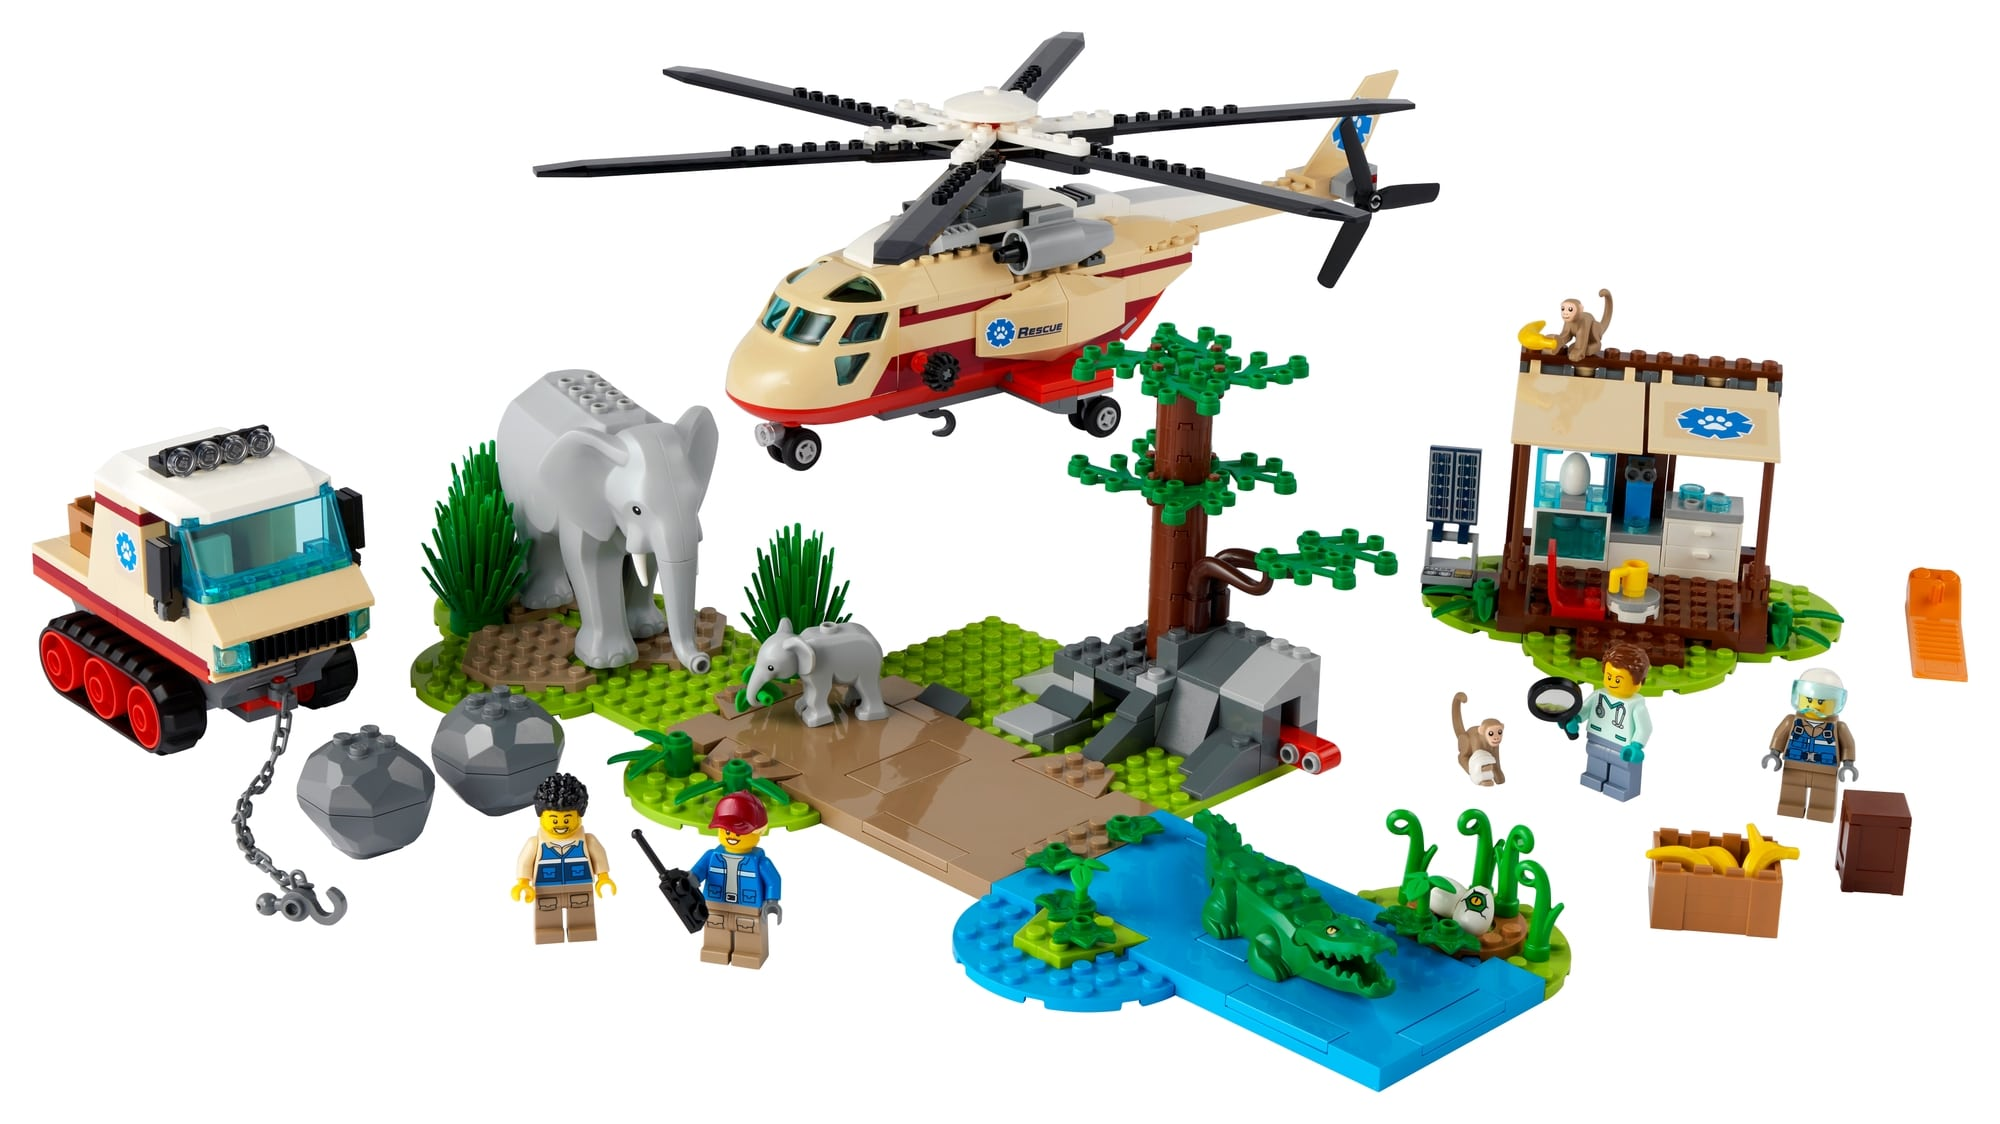 LEGO City 60302 Tierrettungseinsatz 1